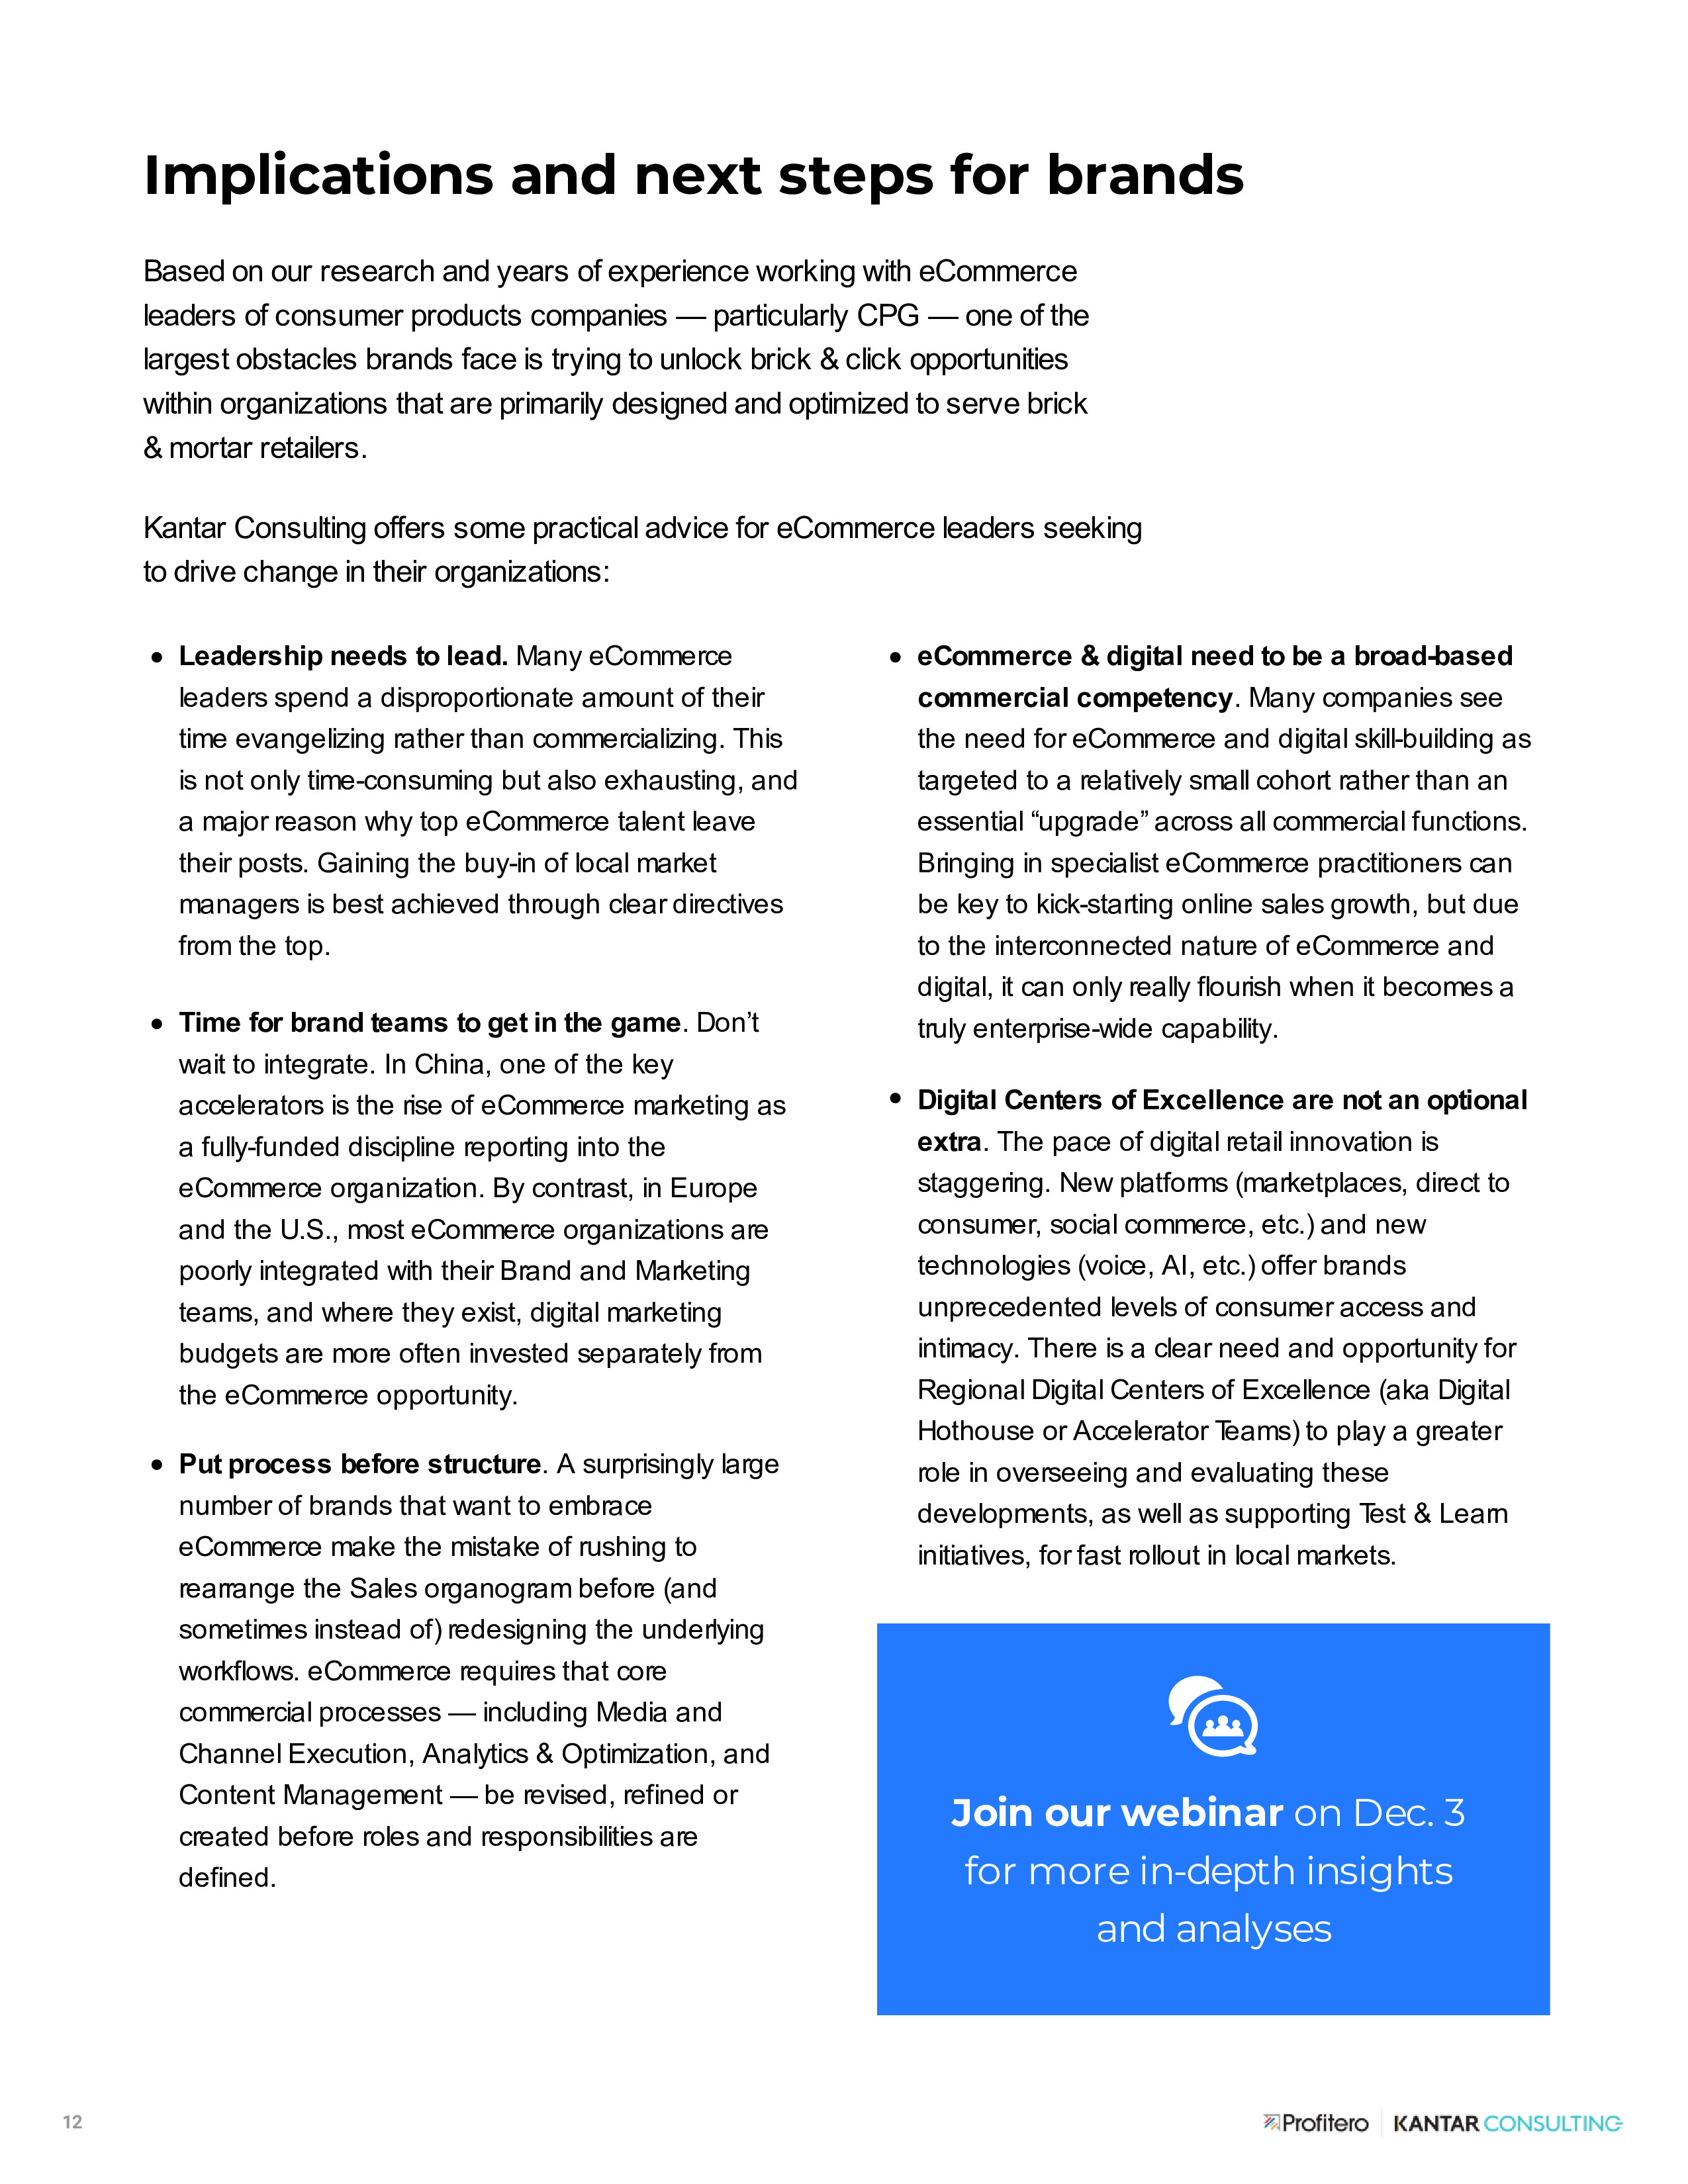 Kantar Consulting:2019年电子商务概览